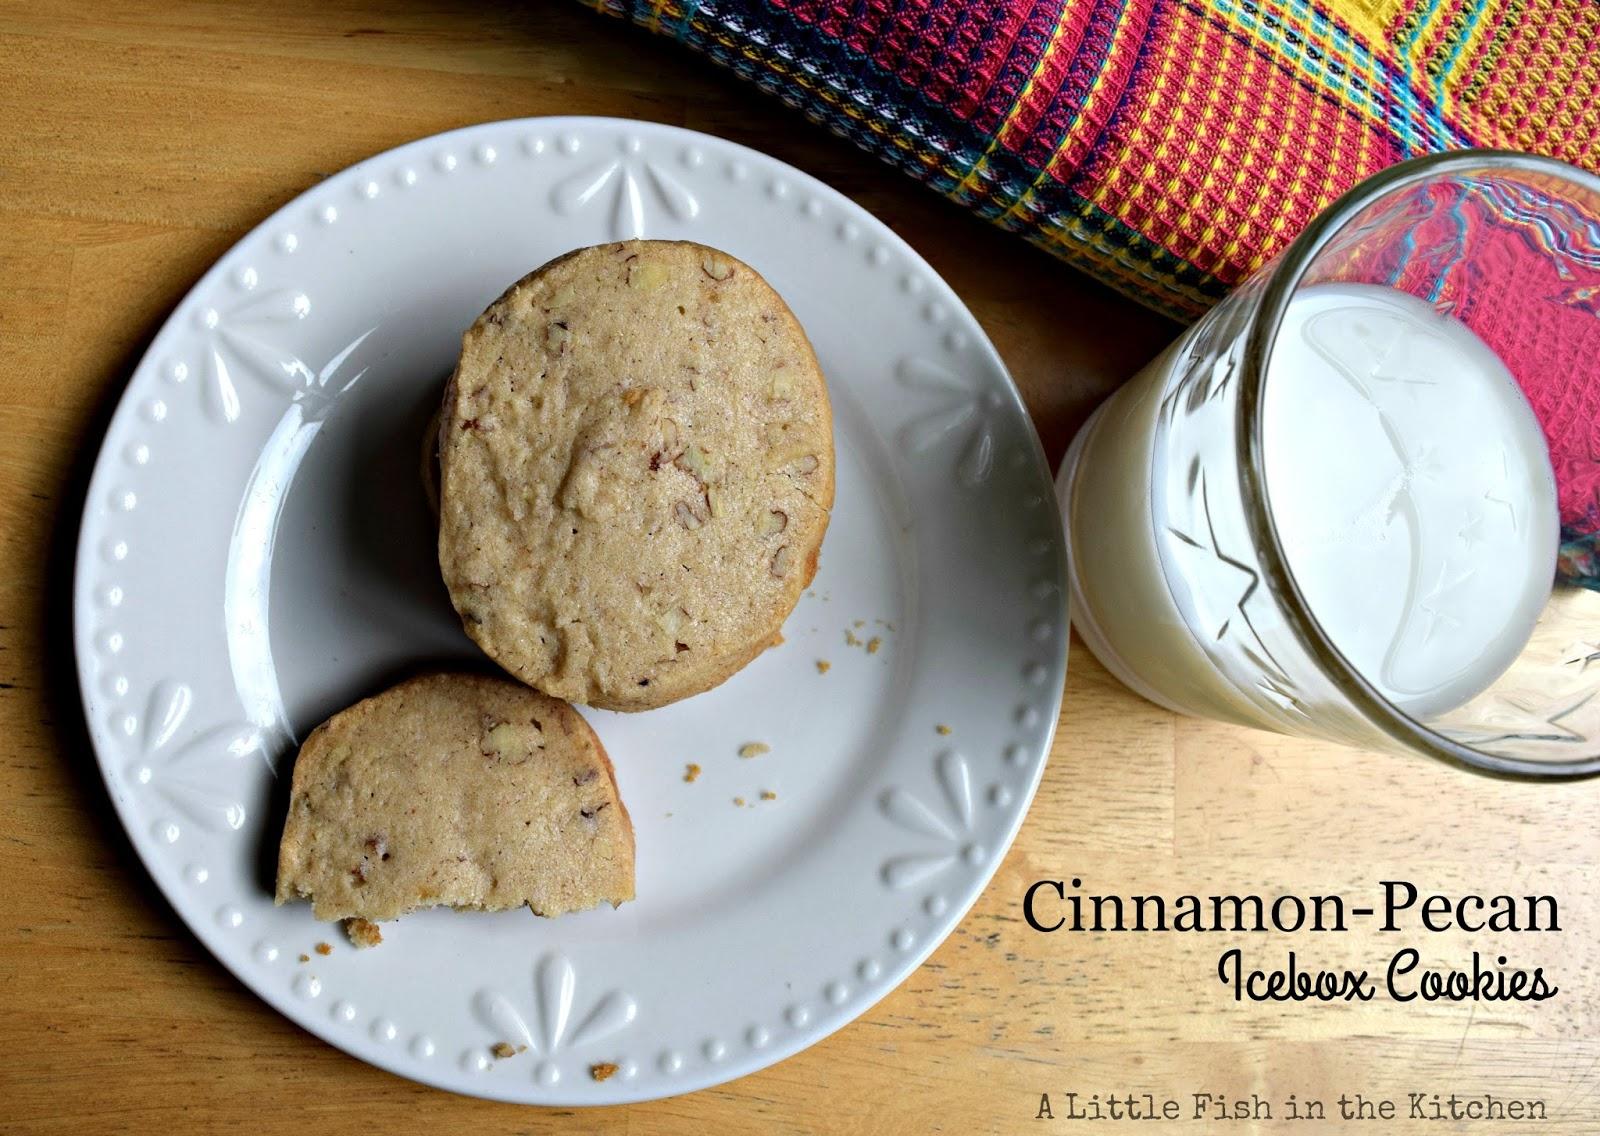 Cinnamon Pecan Icebox Cookies A Little Fish In The Kitchen